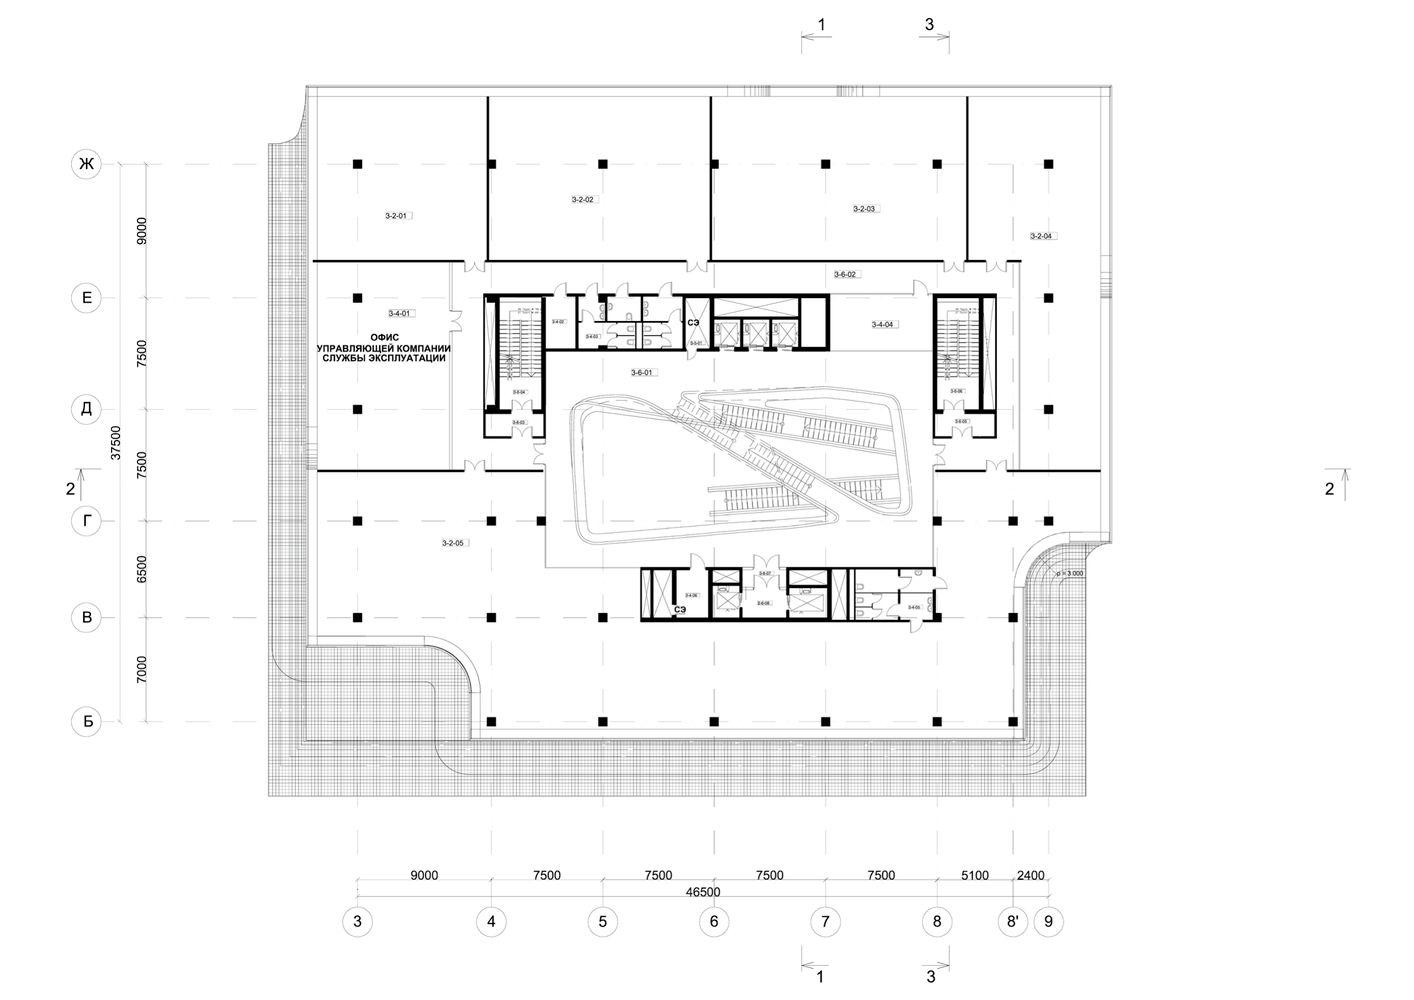 Zaha Hadid Design Concepts And Theory regium waterfront, reggio calabria, italia, zaha hadid architects